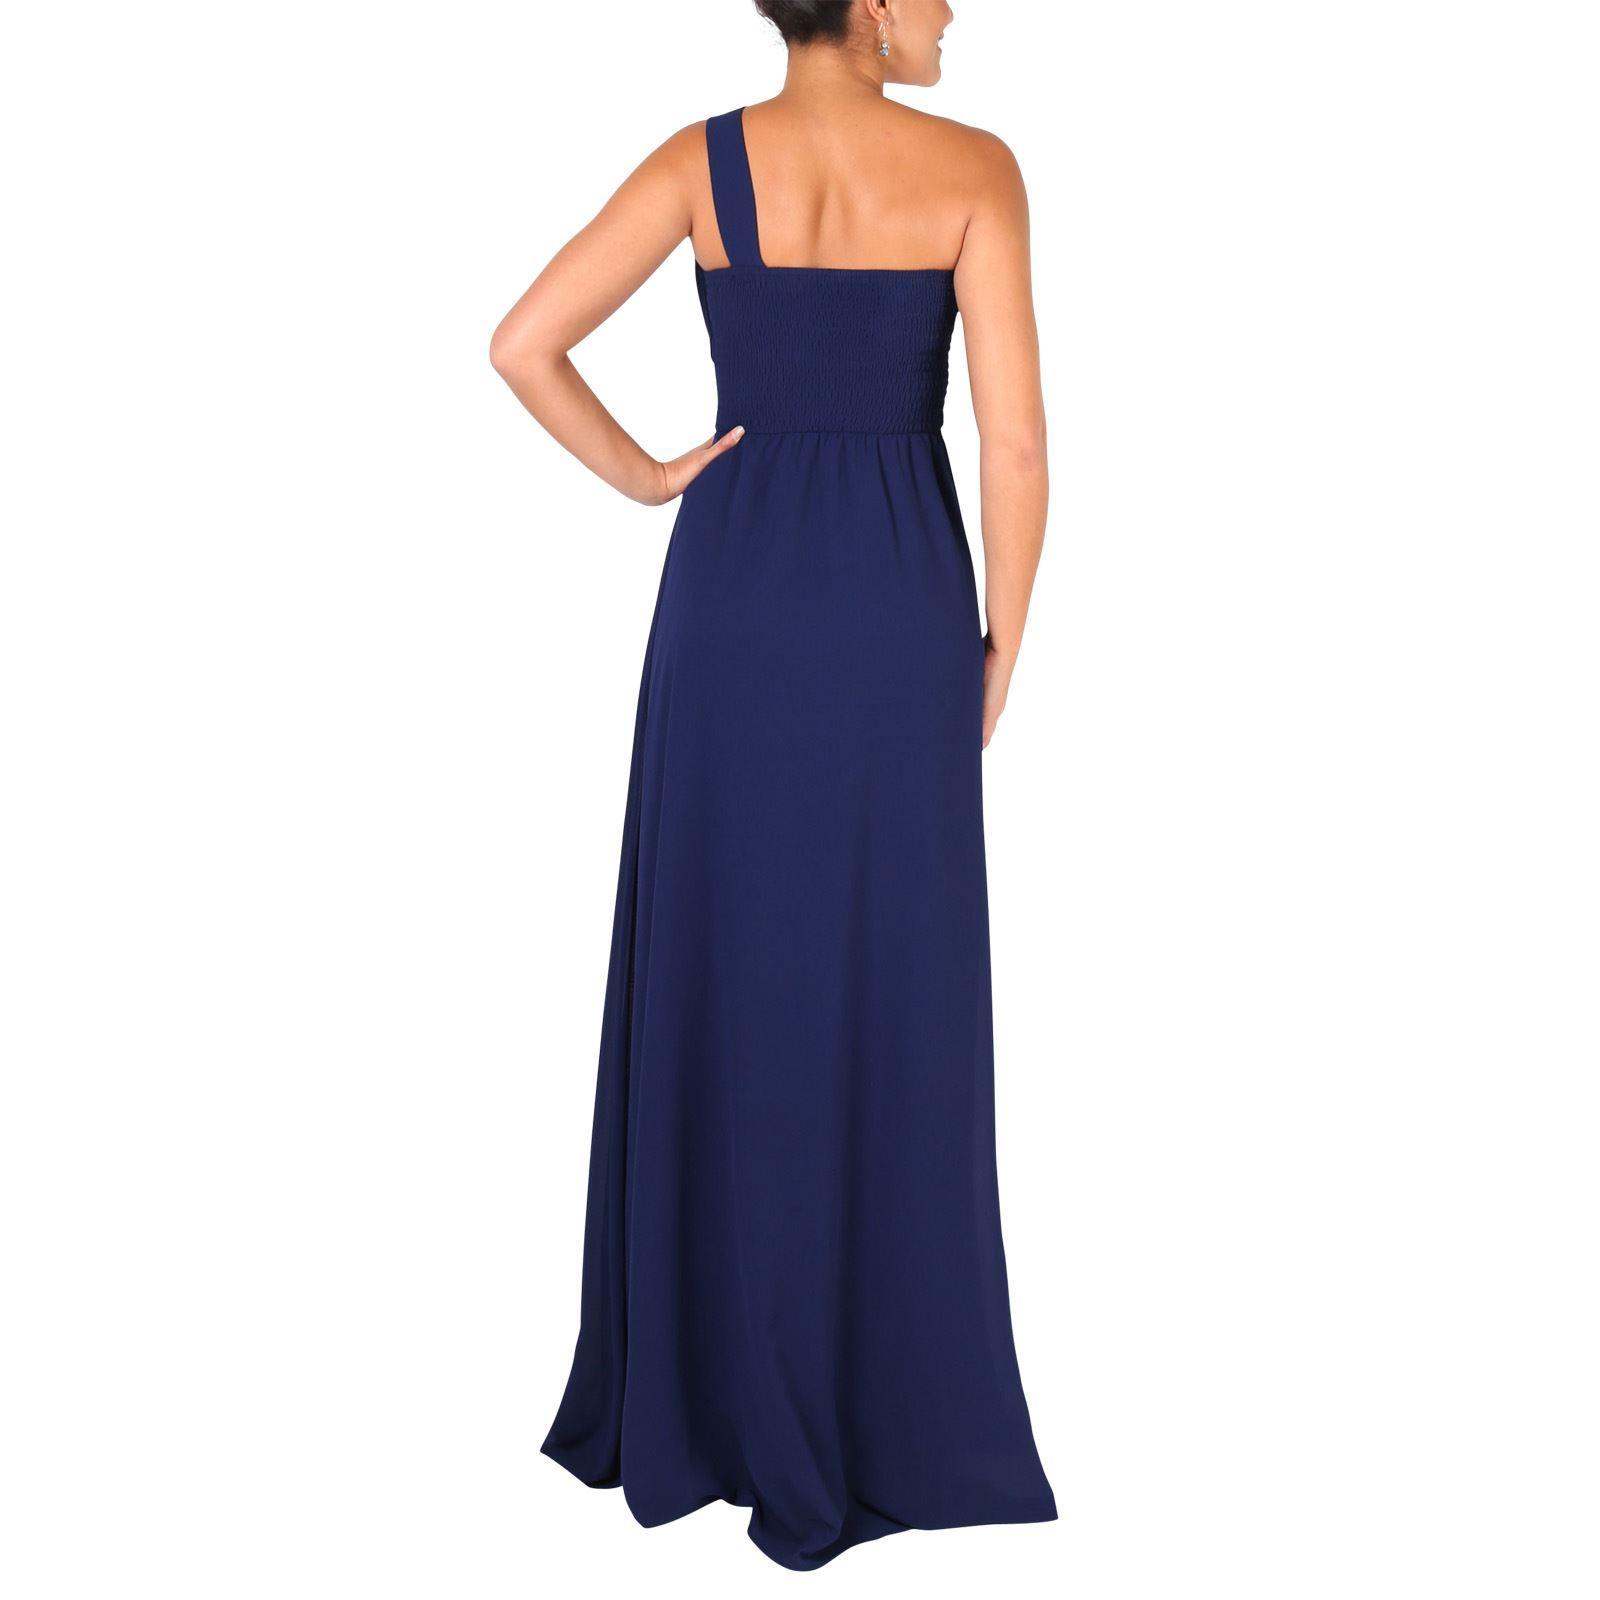 Womens-Wedding-Bridesmaid-Prom-Dress-Formal-One-Off-Shoulder-Long-Evening-8-18 thumbnail 47